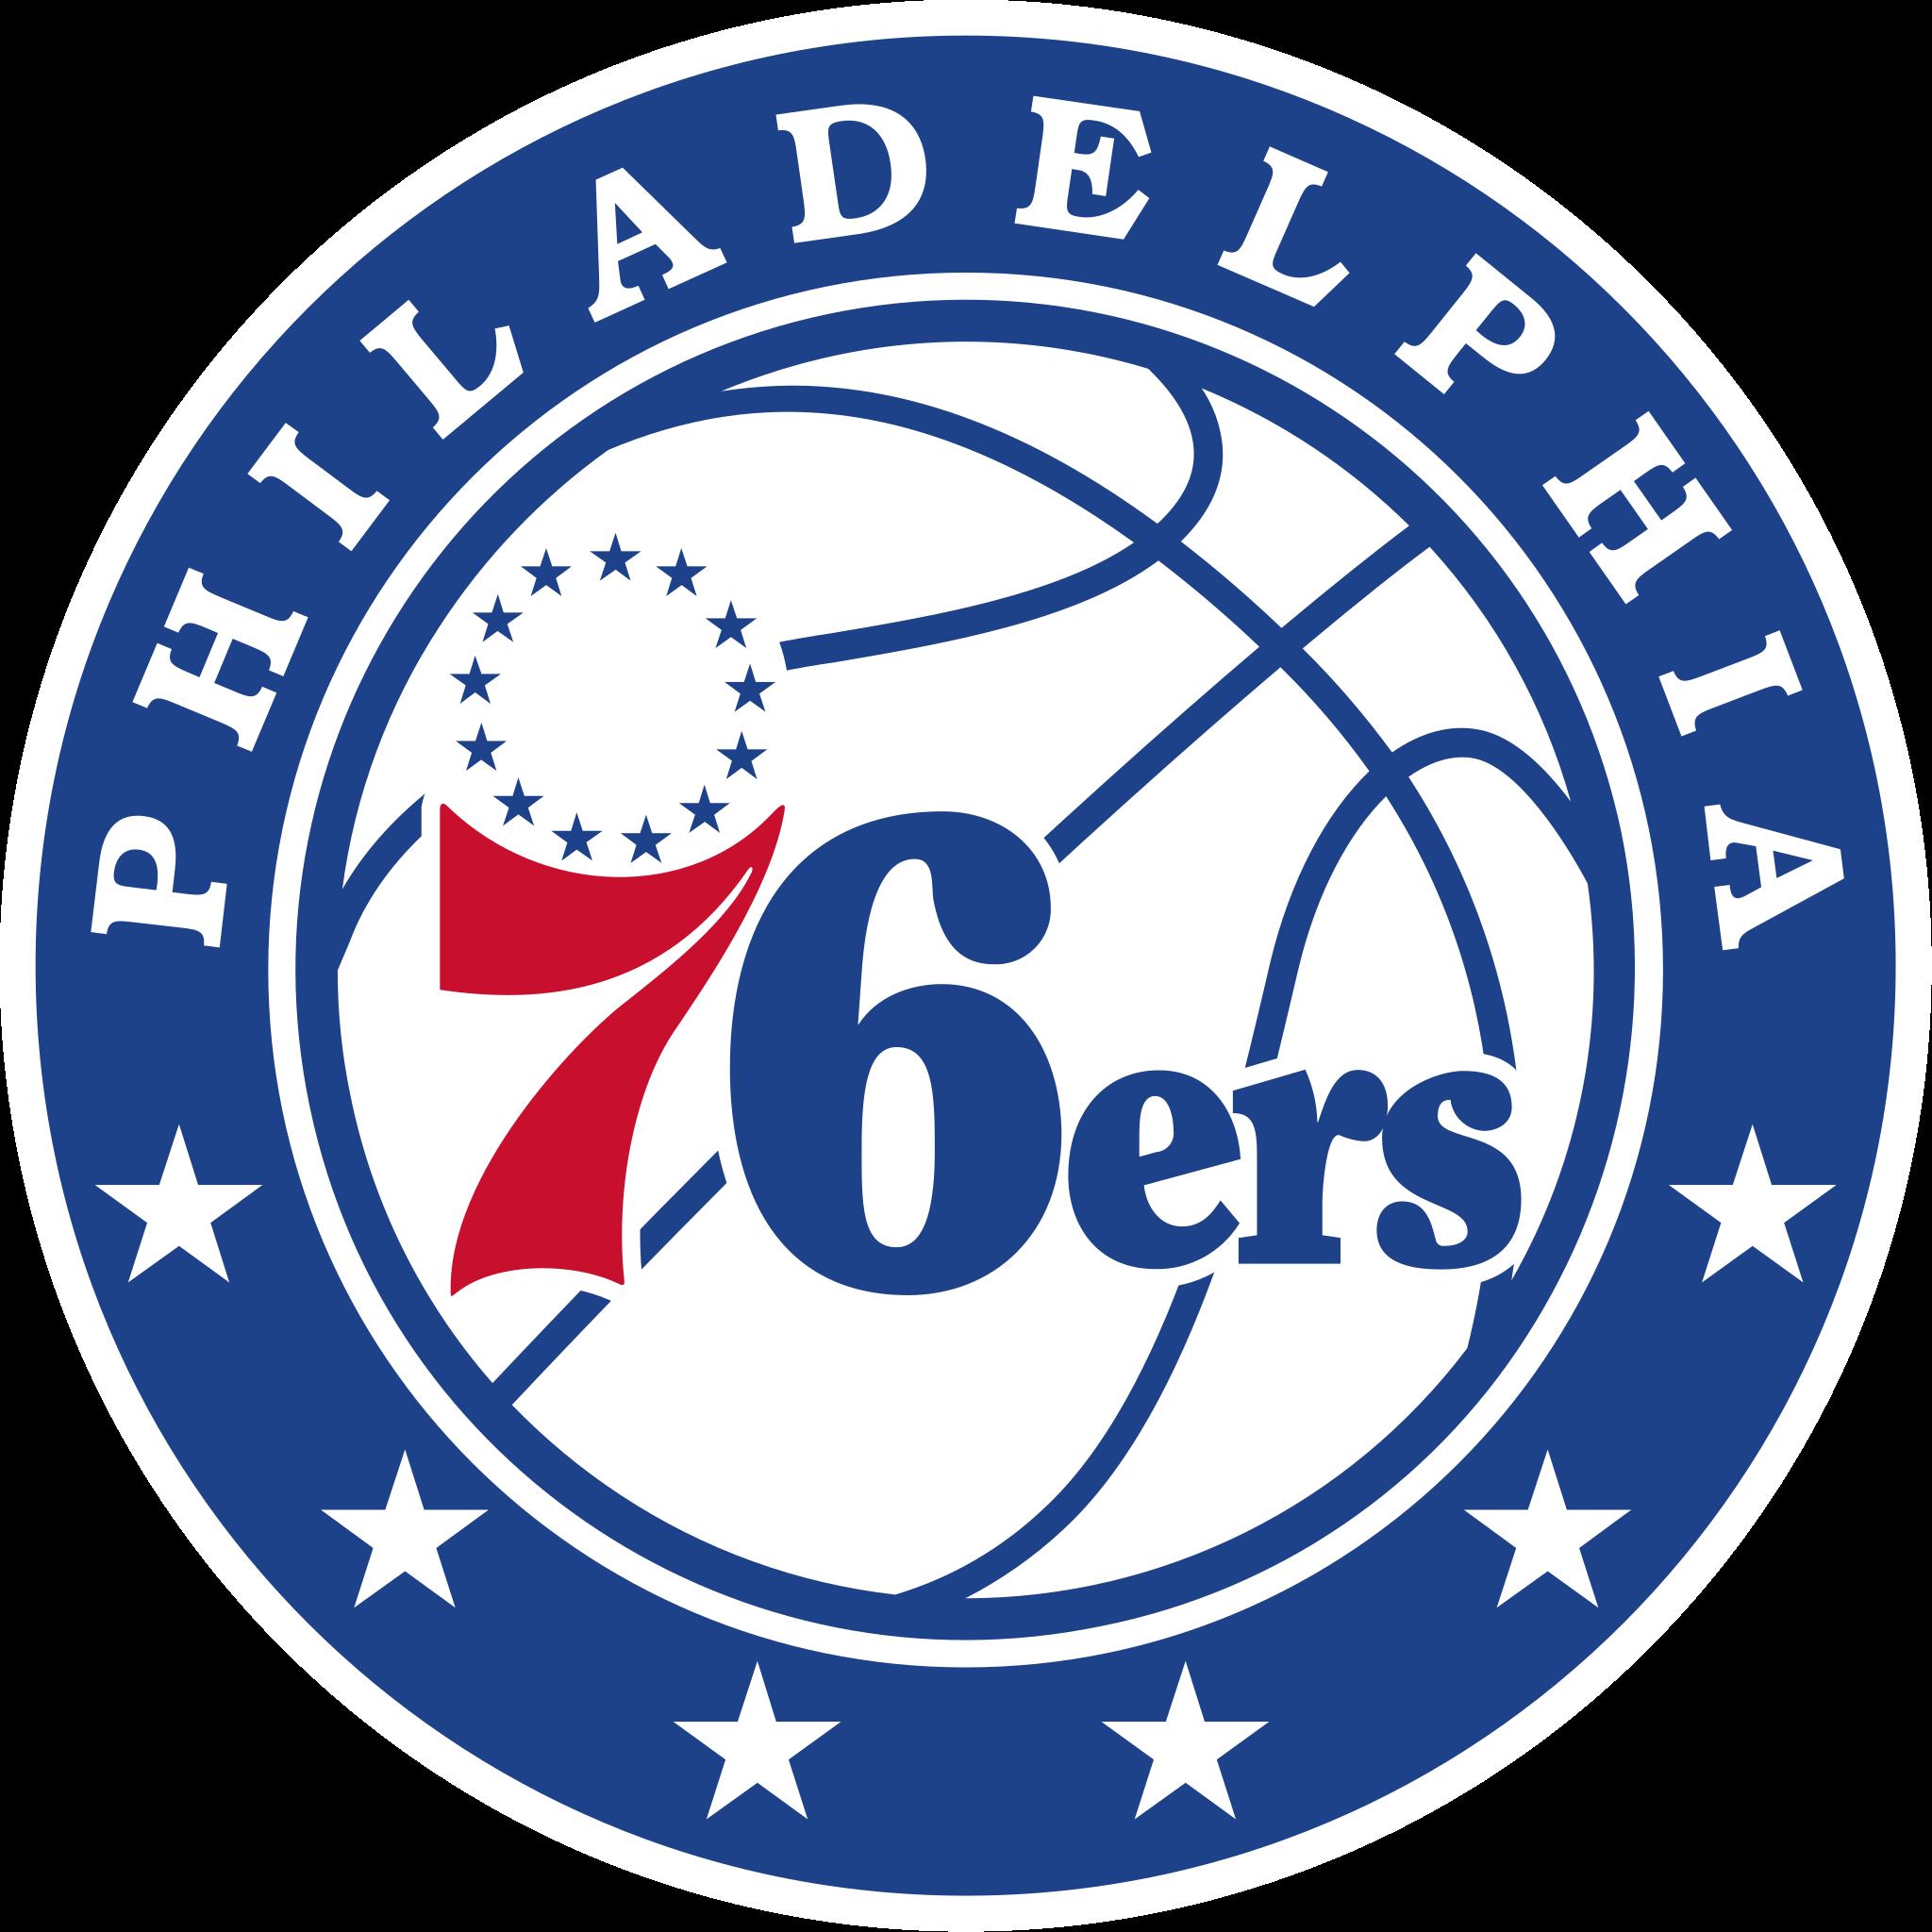 File:Philadelphia76erslogo.png